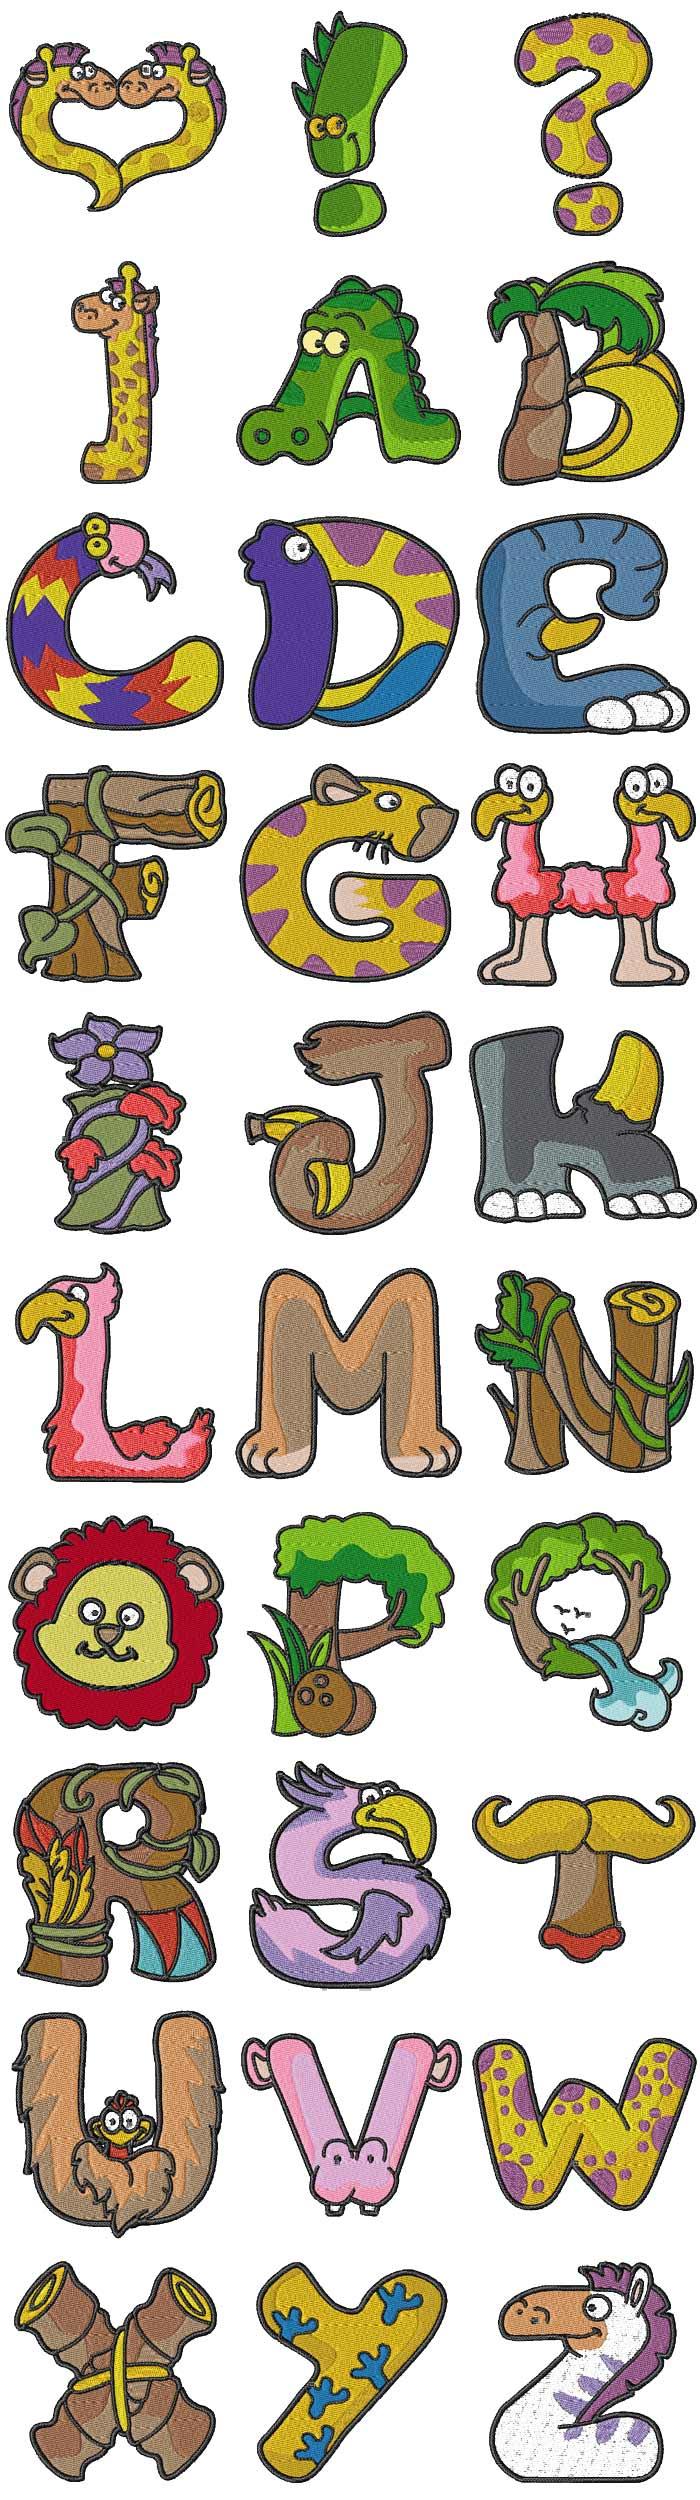 Embroidery machine designs animal alphabet set